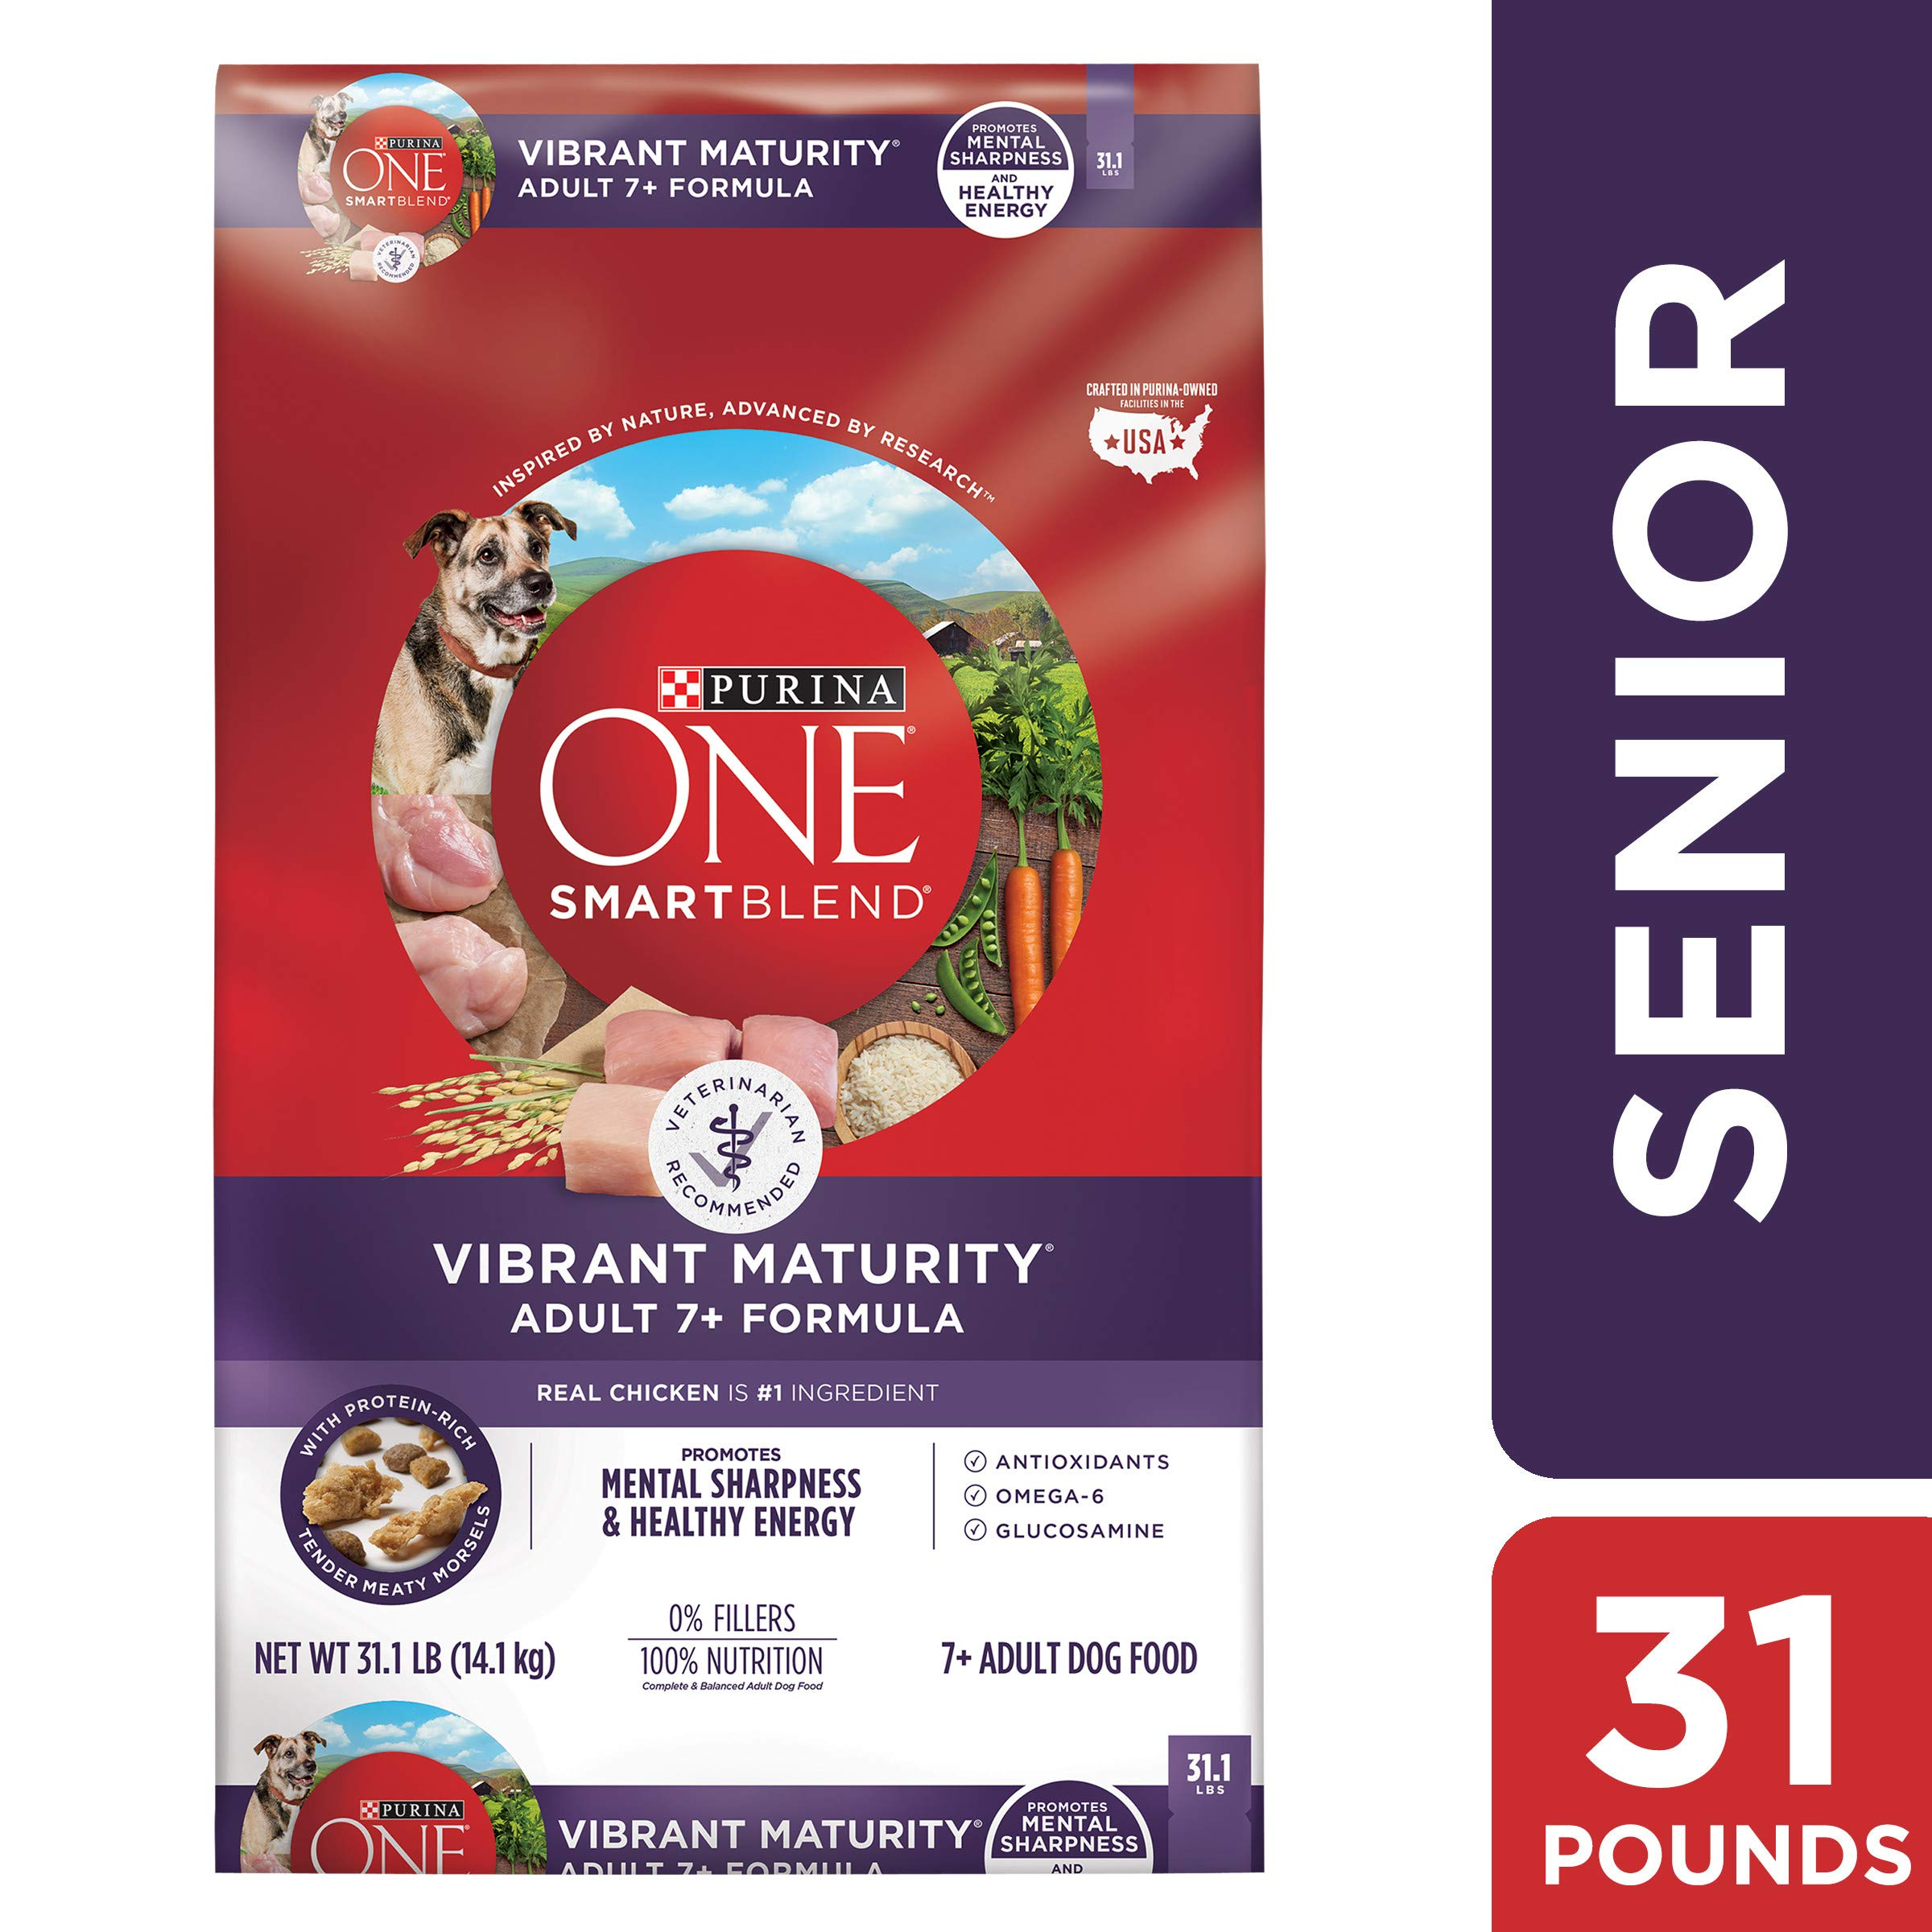 Purina ONE Senior Dry Dog Food, SmartBlend Vibrant Maturity Adult 7+ Formula - 31.1 lb. Bag by Purina ONE